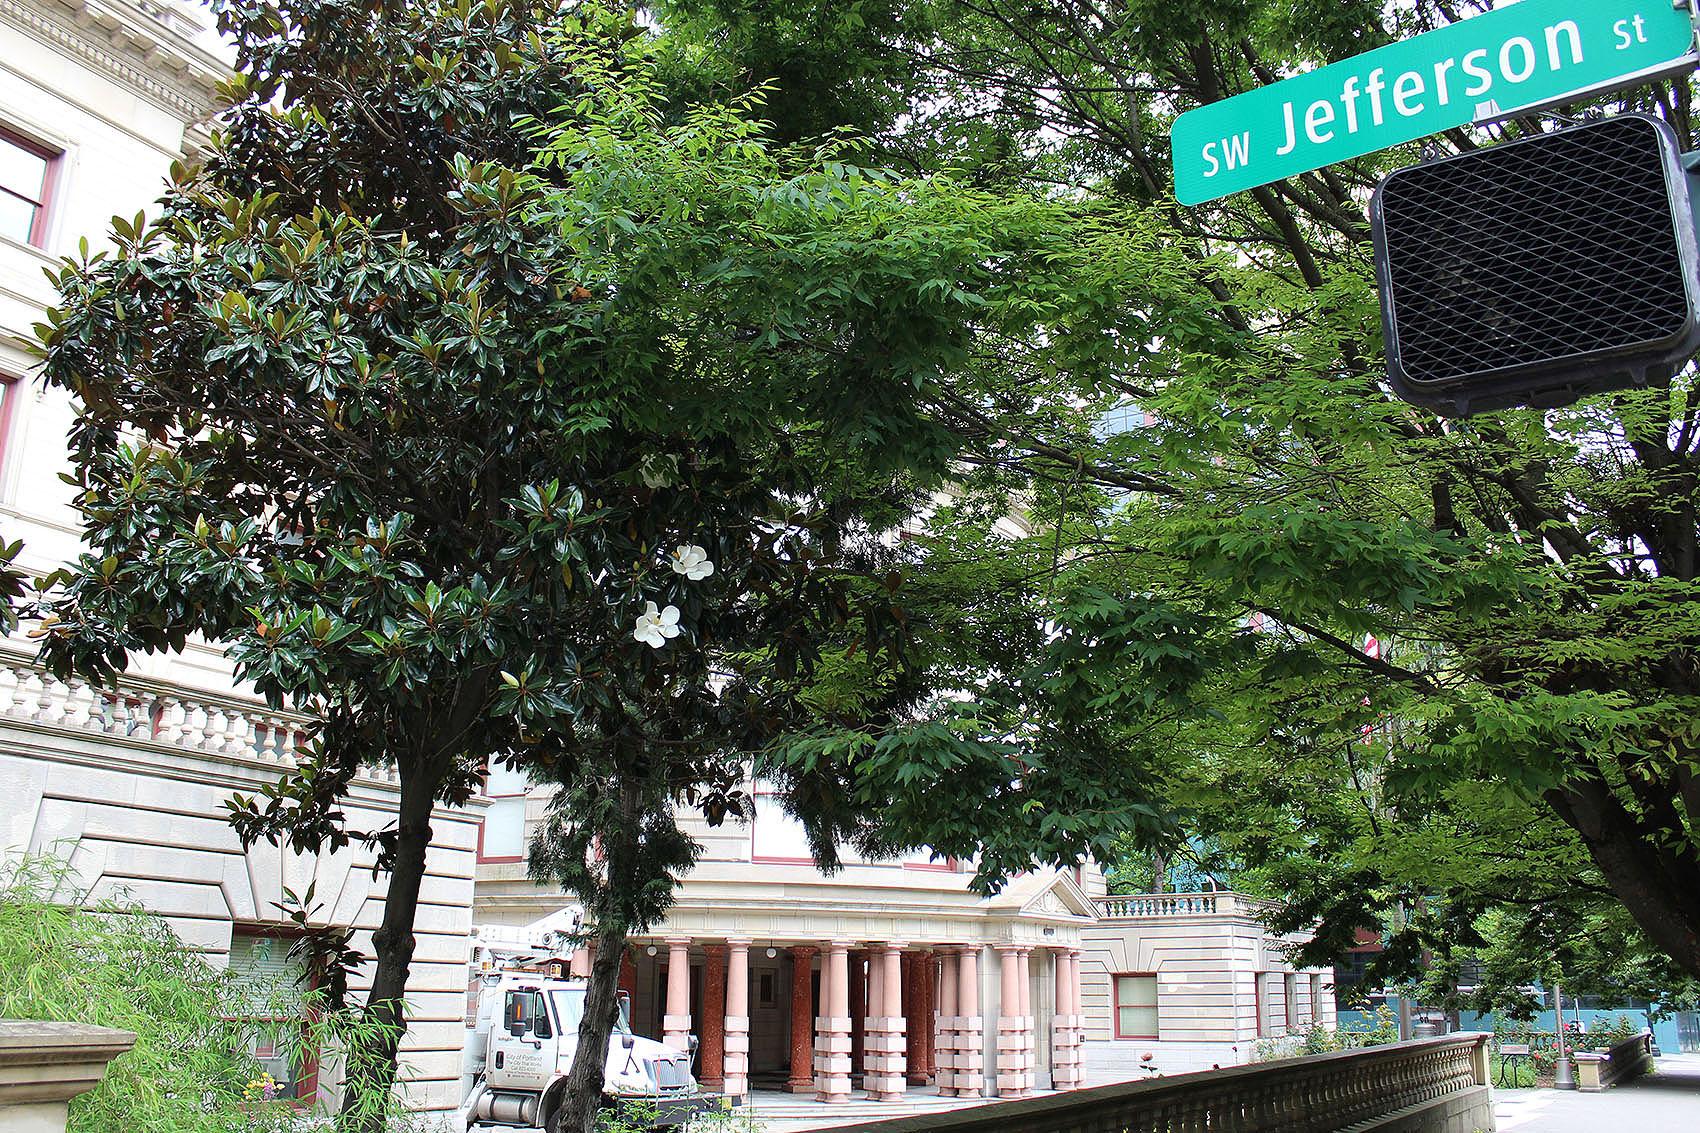 Portland City Hall behind a Jefferson street sign